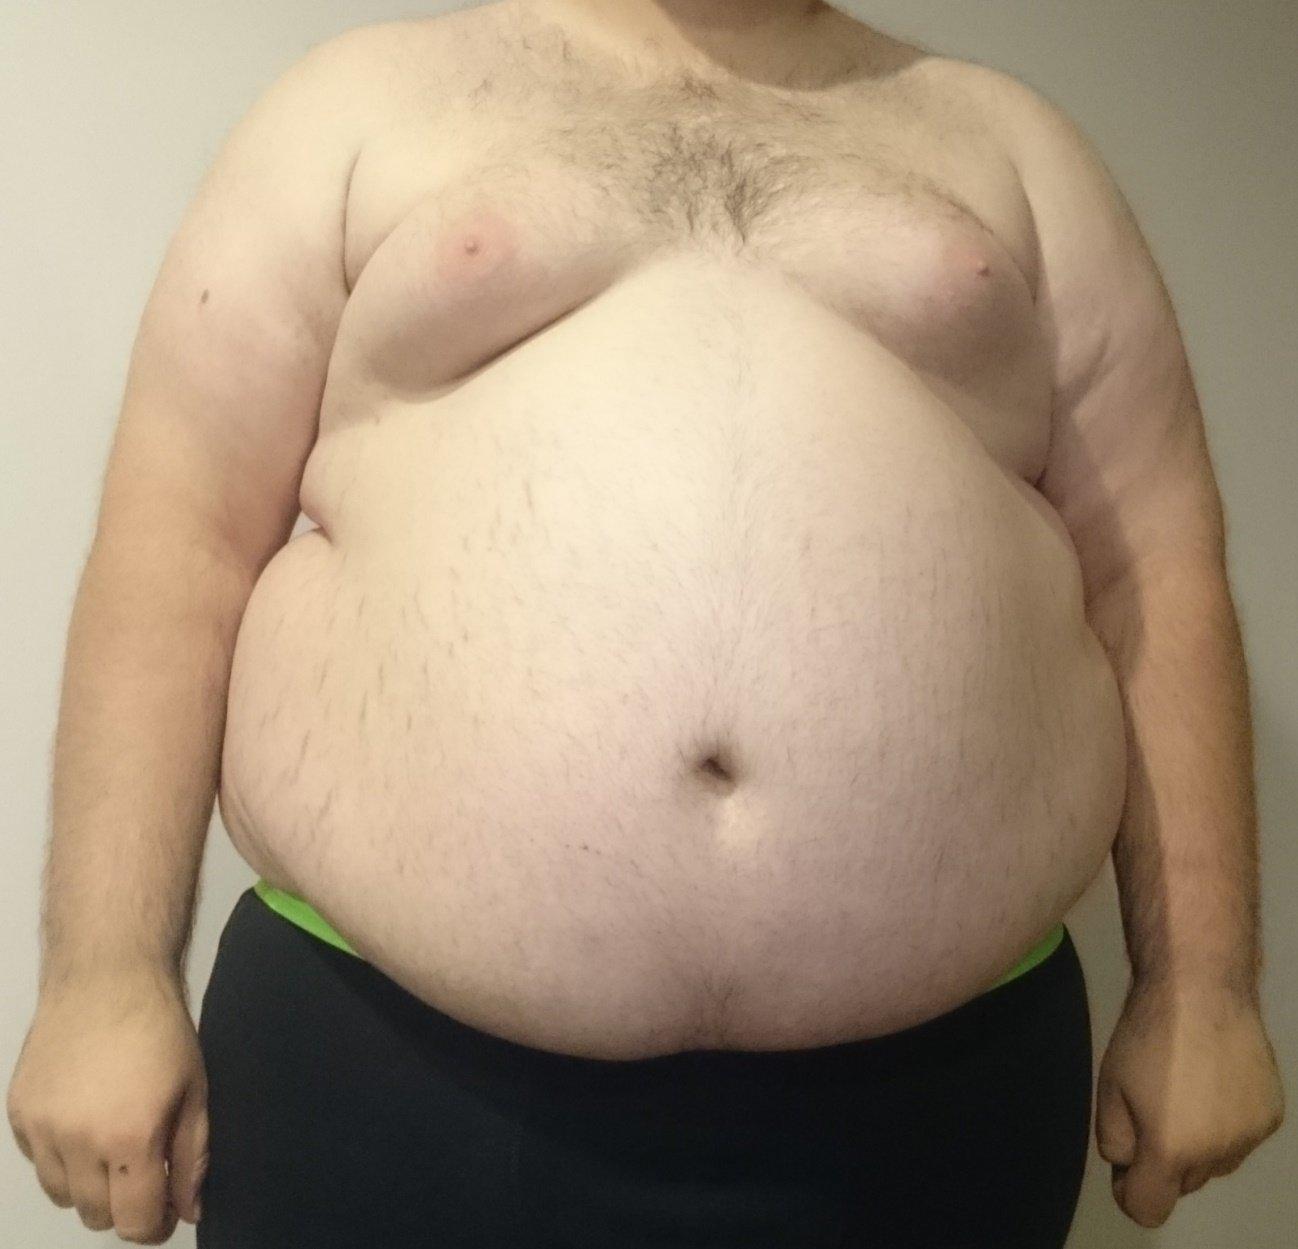 Obesidad tipo manzana